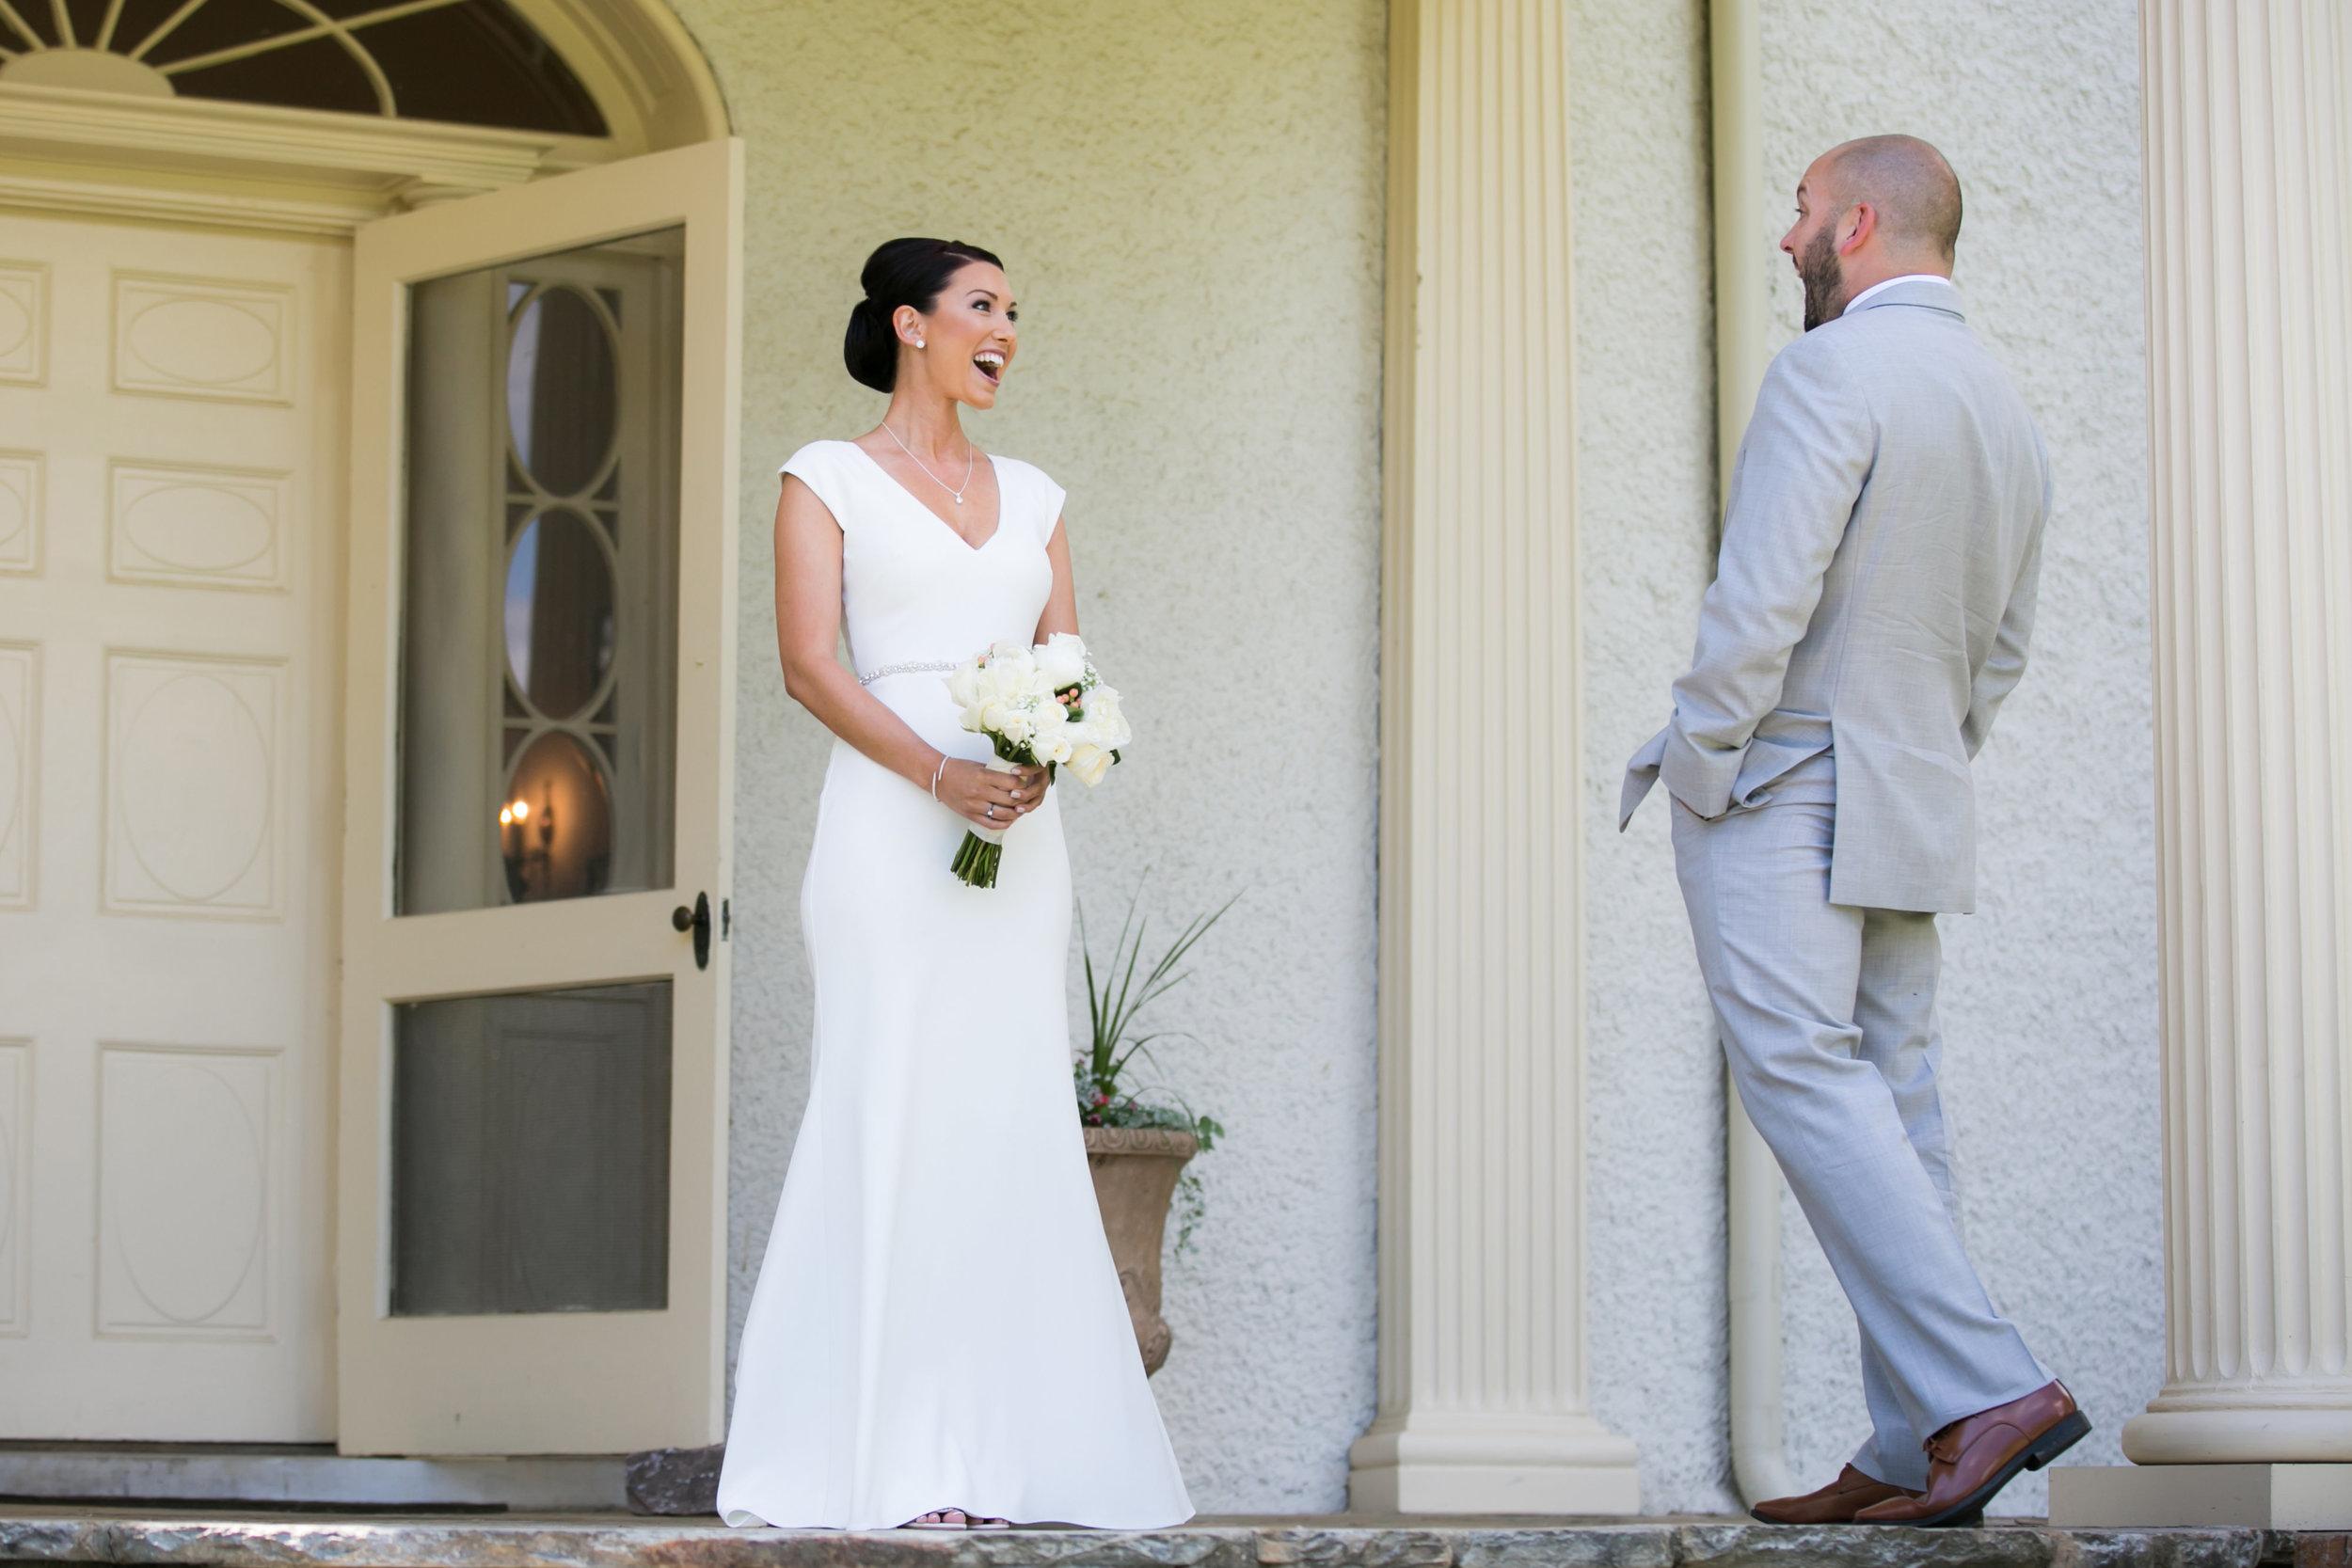 Pure elegance events Tynise Kee dc wedding planner va wedding planner rust manor house leesburg -0012.jpg